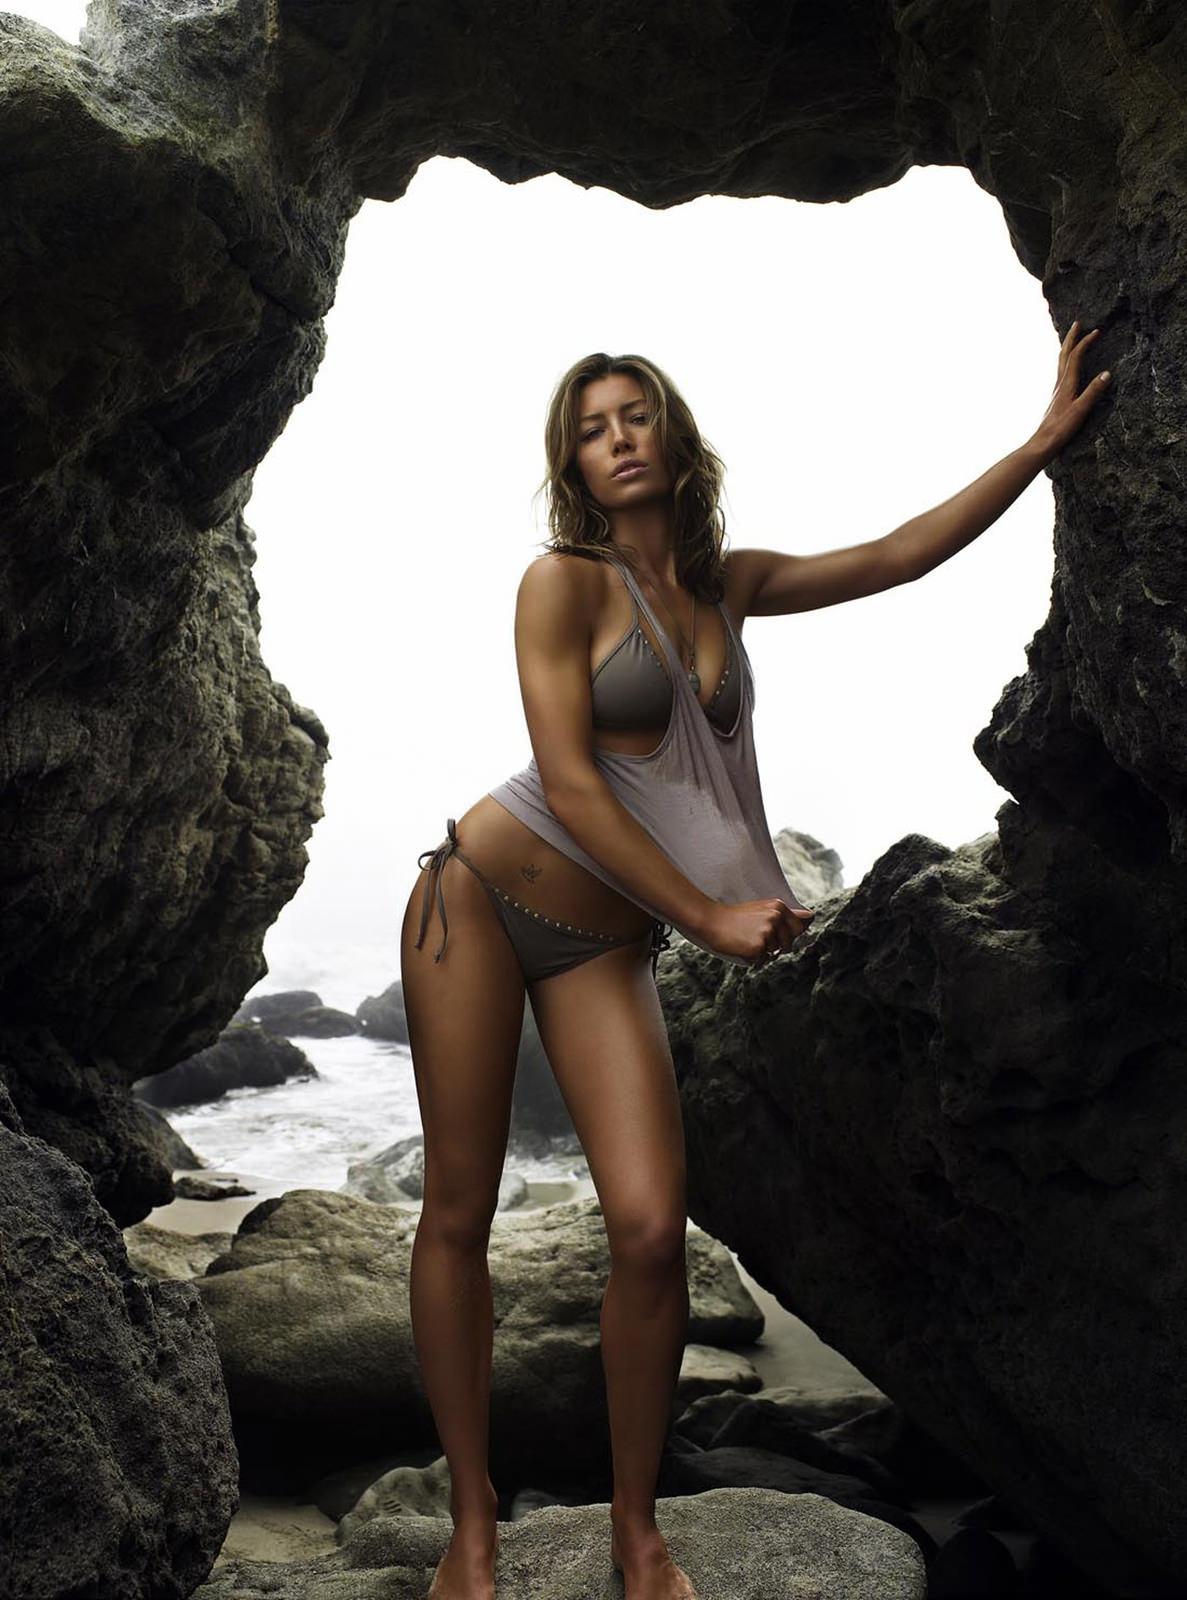 Jessica Biel Photo Gallery